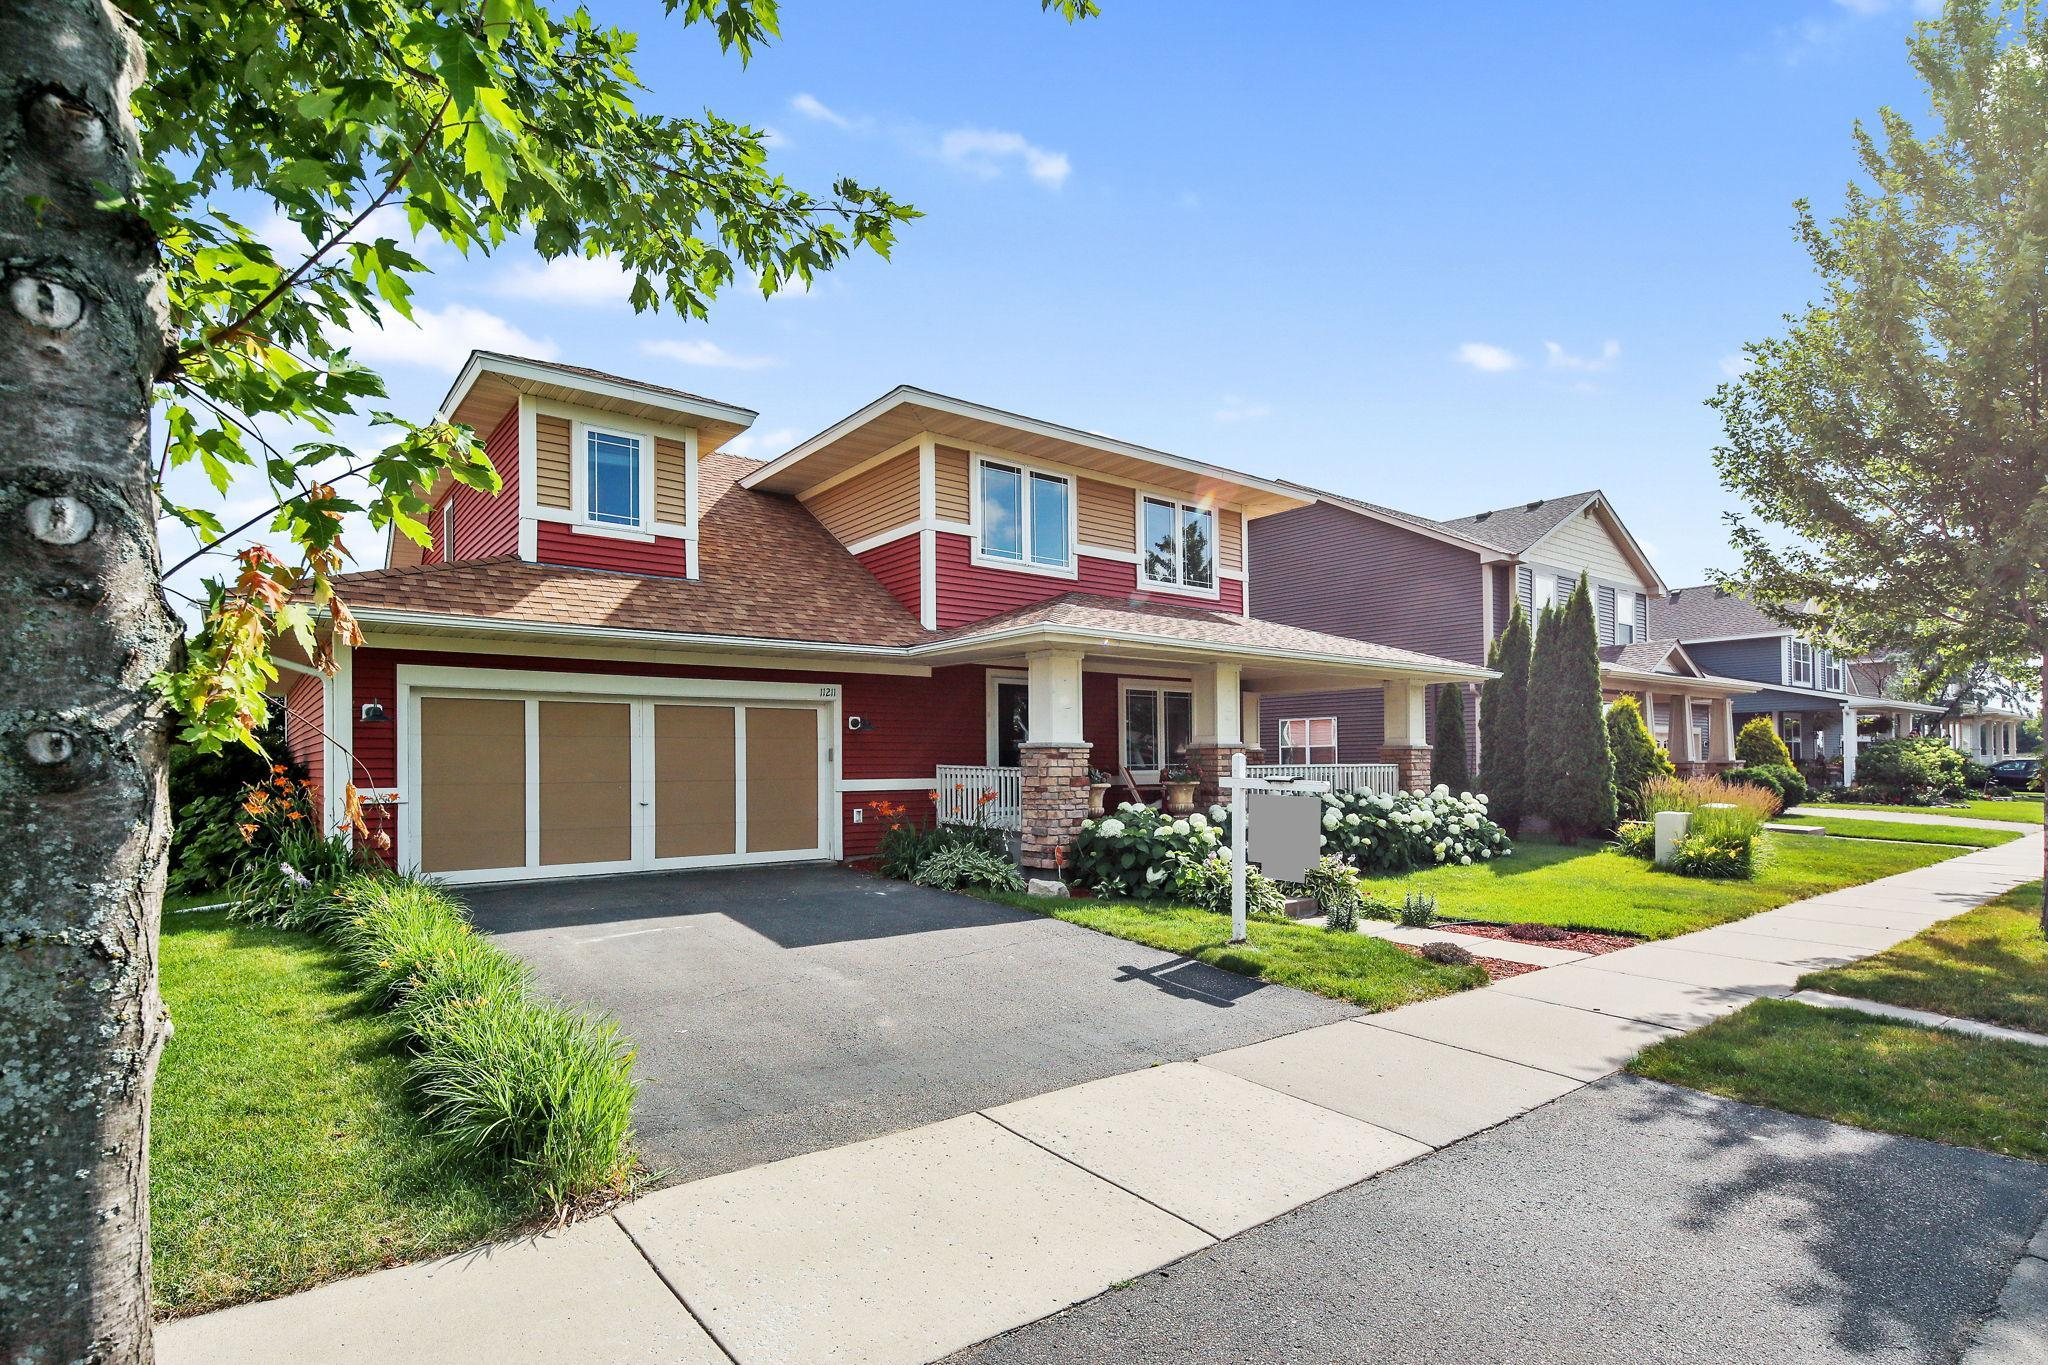 11211 69th Street NE Property Photo - Albertville, MN real estate listing